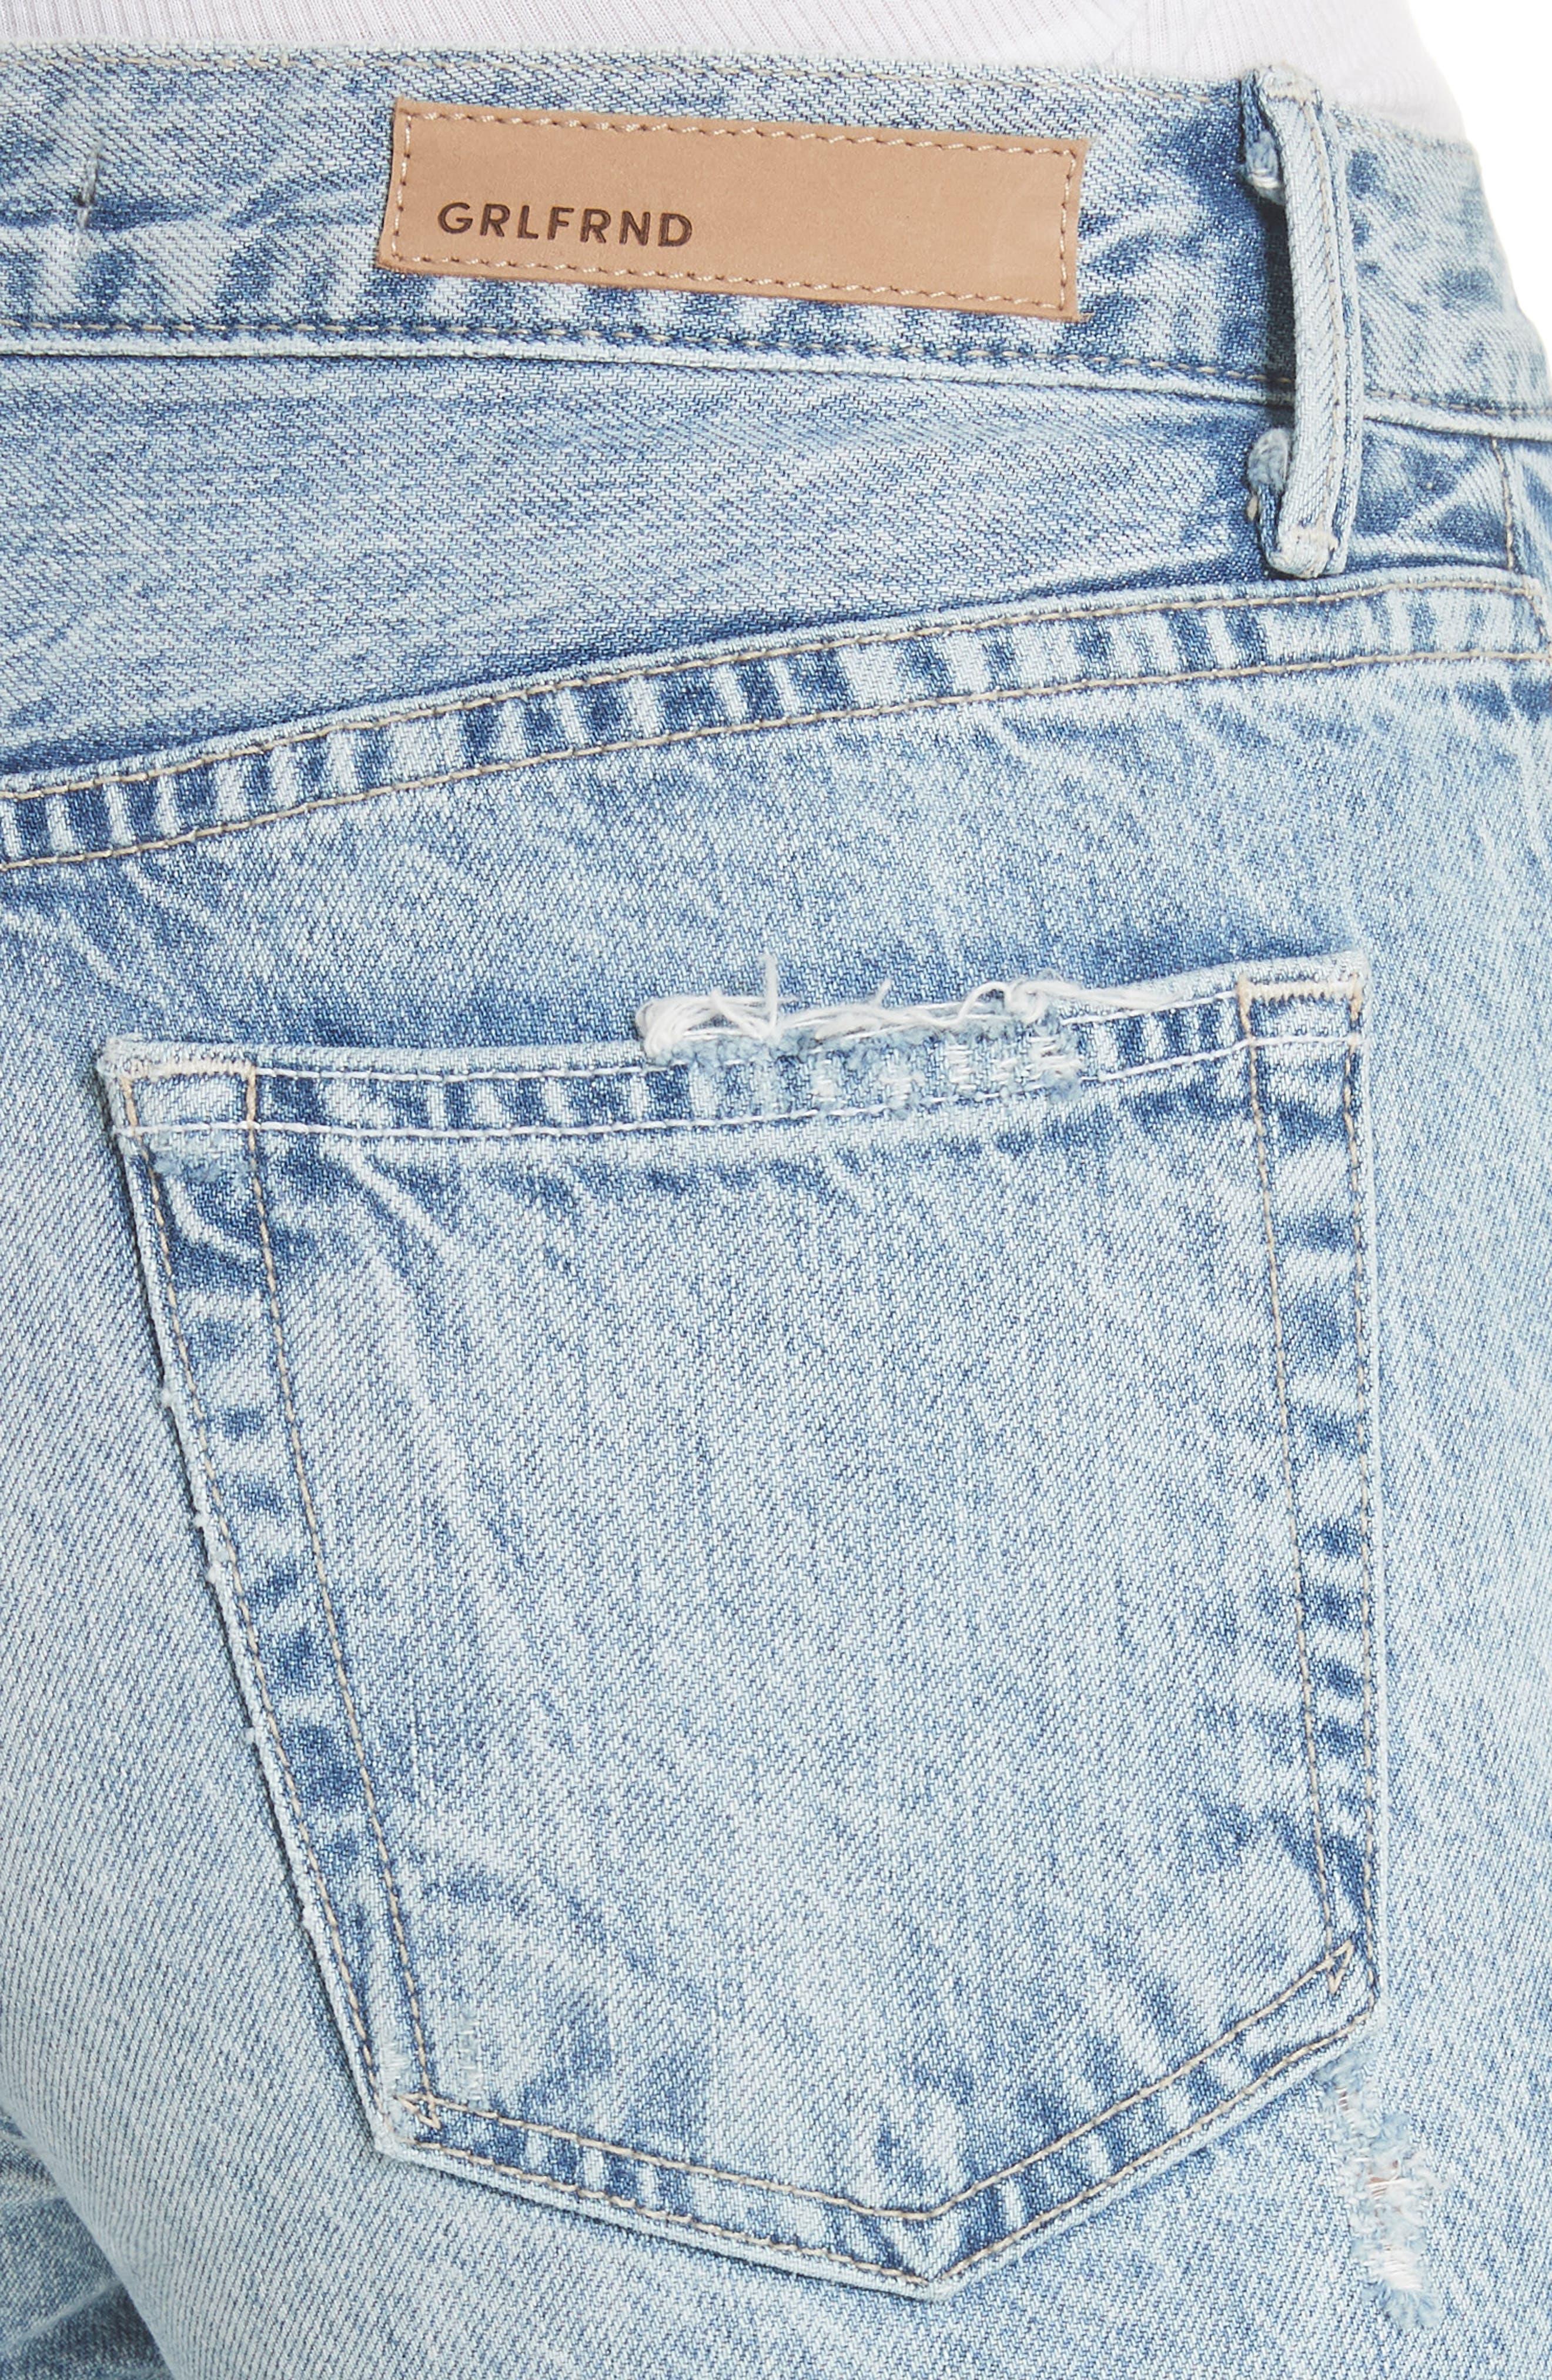 Helena Frayed Hem High Waist Jeans,                             Alternate thumbnail 4, color,                             HOLD ON